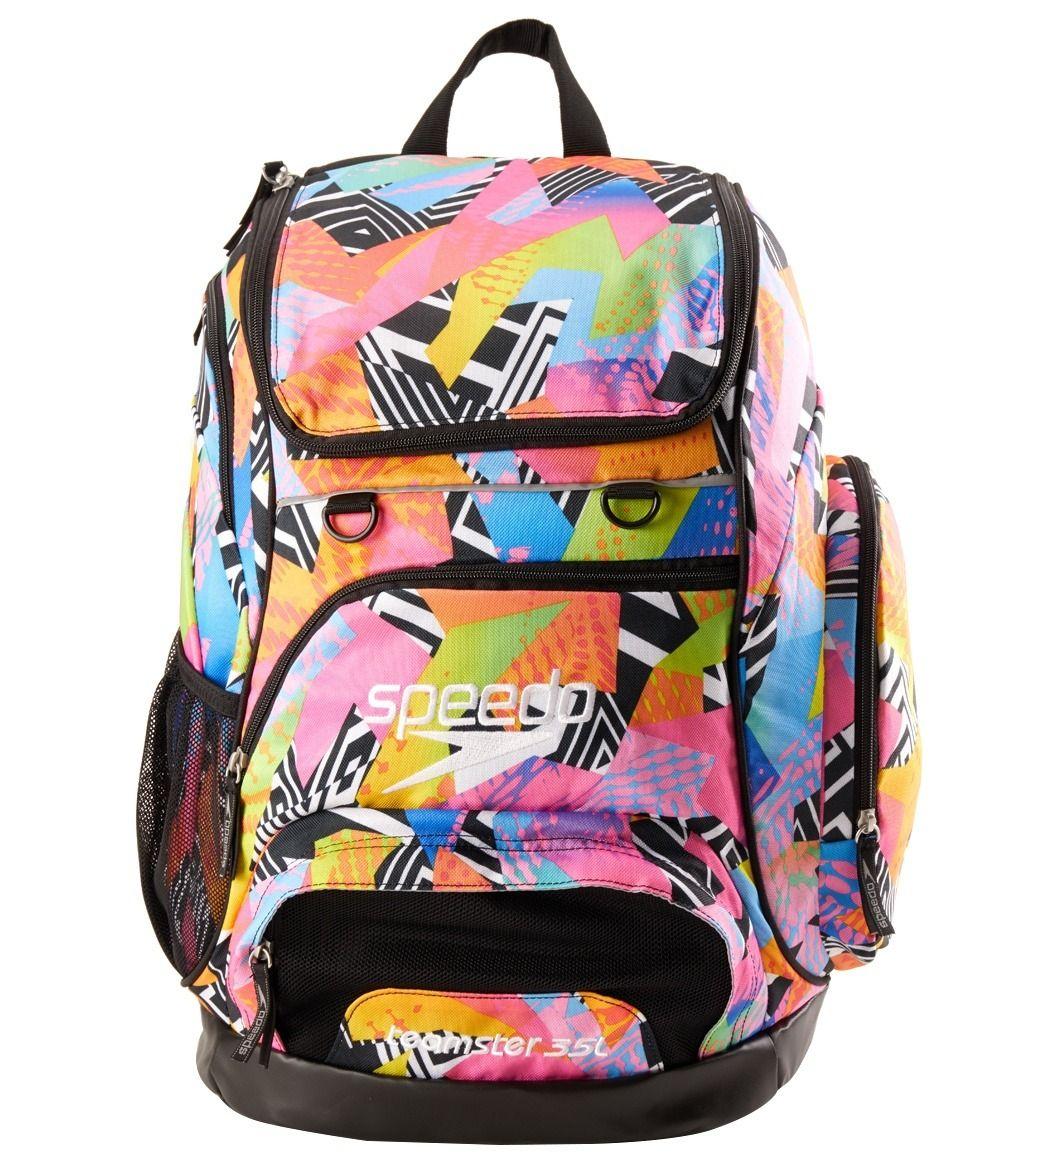 Swim Gear Bag: Speedo Large 35L Teamster Backpack At SwimOutlet.com